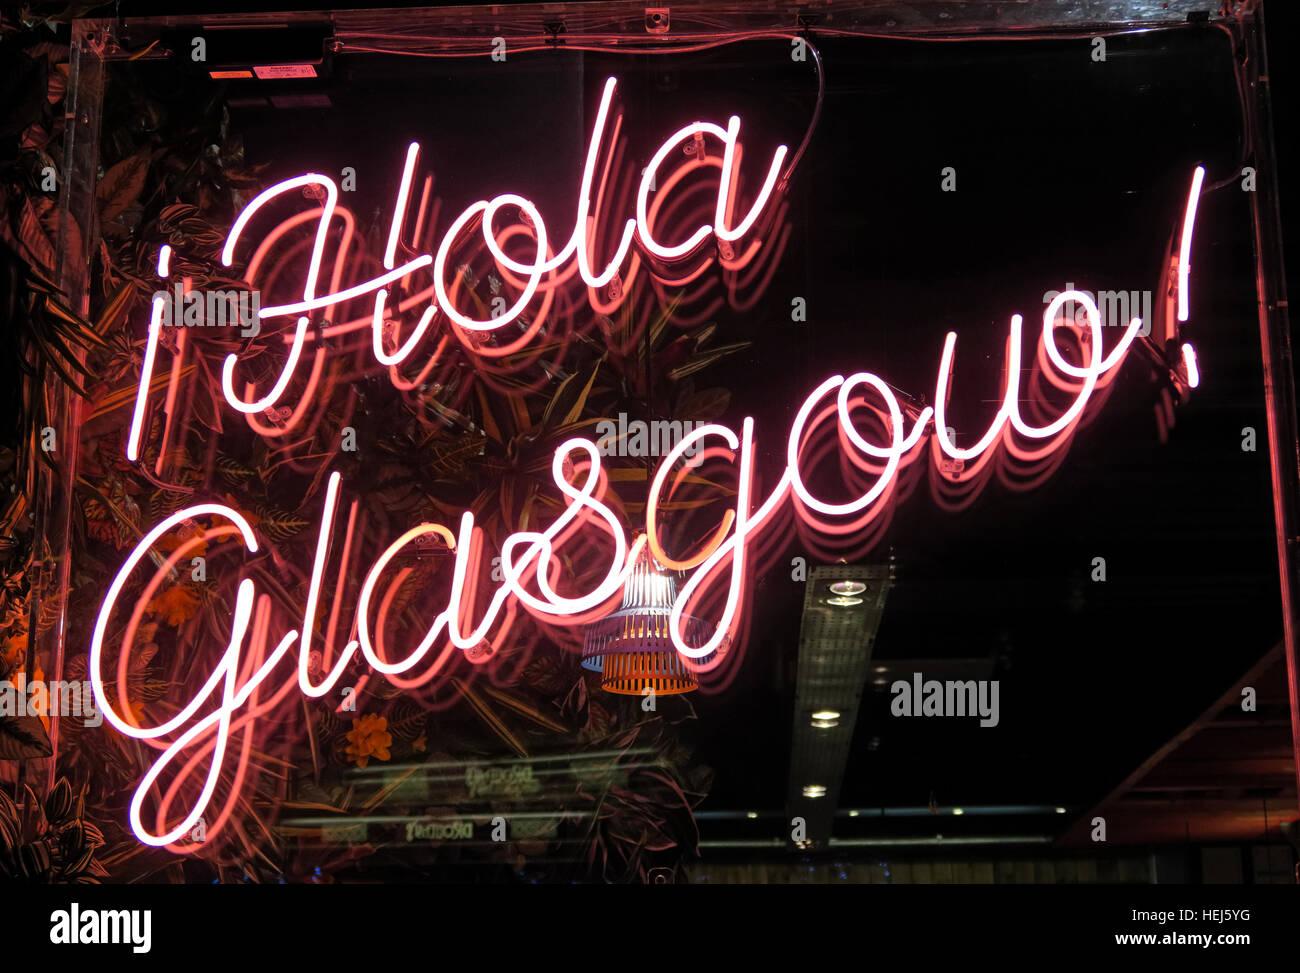 Glaswegian,hello,Hello Glasgow,lit,lighted,up,illumination,illuminated,Hola,Glasgow,neon,sign,city,centre,Glasgow!,signs,electric,GoTonySmith,@HotpixUK,Tony,Smith,UK,GB,Great,Britain,United,Kingdom,Scots,Scottish,British,Scotland,Glasgow,Greater,problem,with,problem with,issue with,City,Centre,cities,Urban,Urbanist,town,infrastructure,transport,tour,tourism,tourists,urban,attraction,attractions,Buy Pictures of,Buy Images Of,Images of,Stock Images,Tony Smith,United Kingdom,Great Britain,Greater Glasgow,British Isles,Glasgow City Centre,City Centre